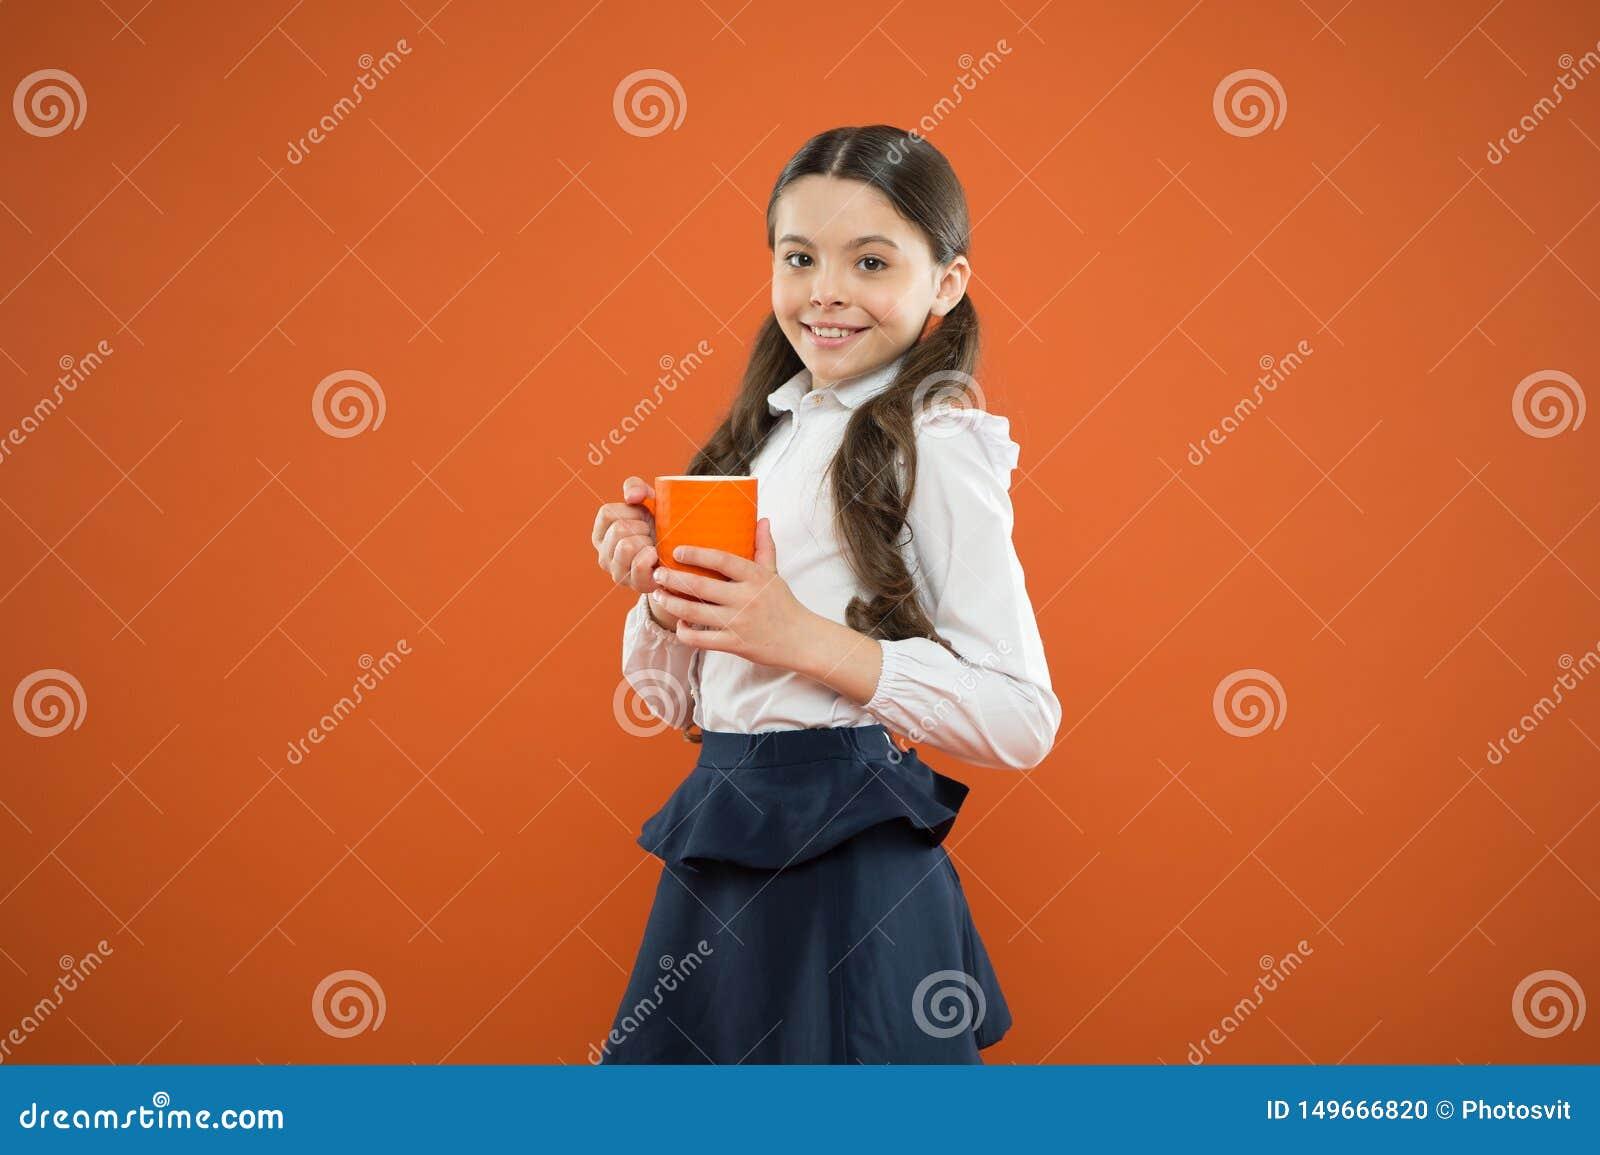 Water balance. Enjoying tea before school classes. Drink enough water. Inspiring drink. Girl drink cocoa or tea